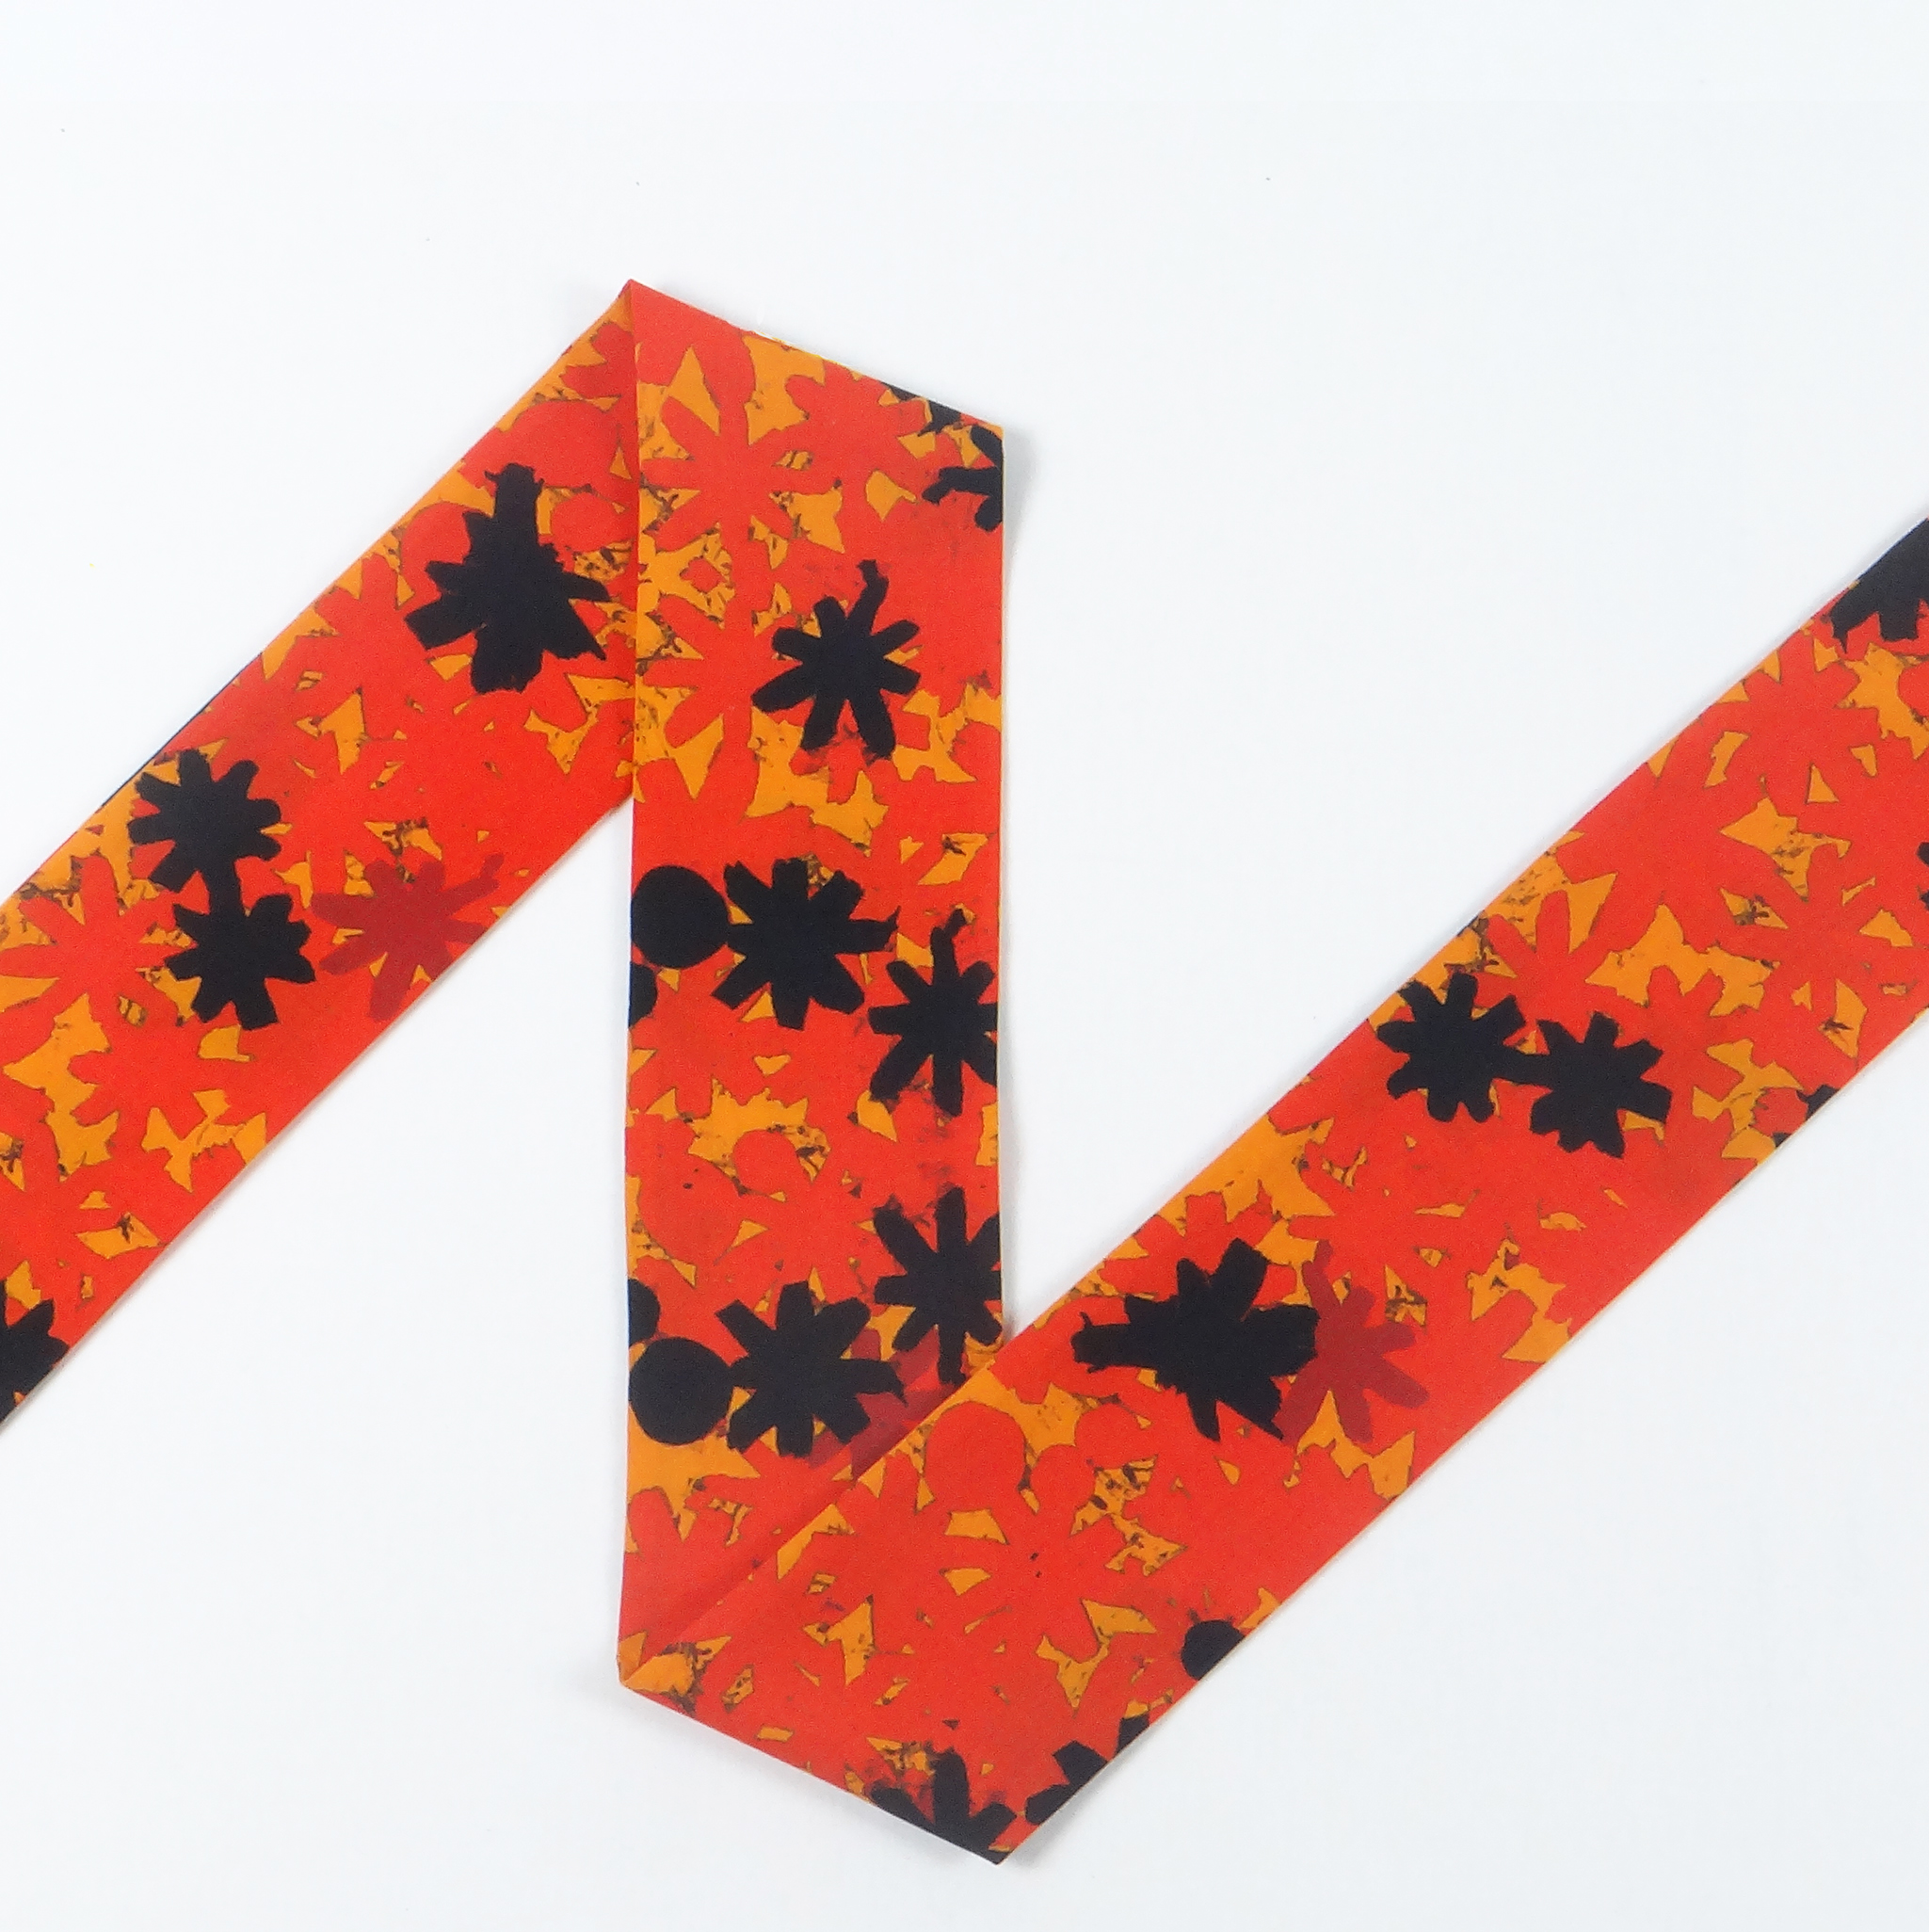 Splotch Flowers - Tangerine